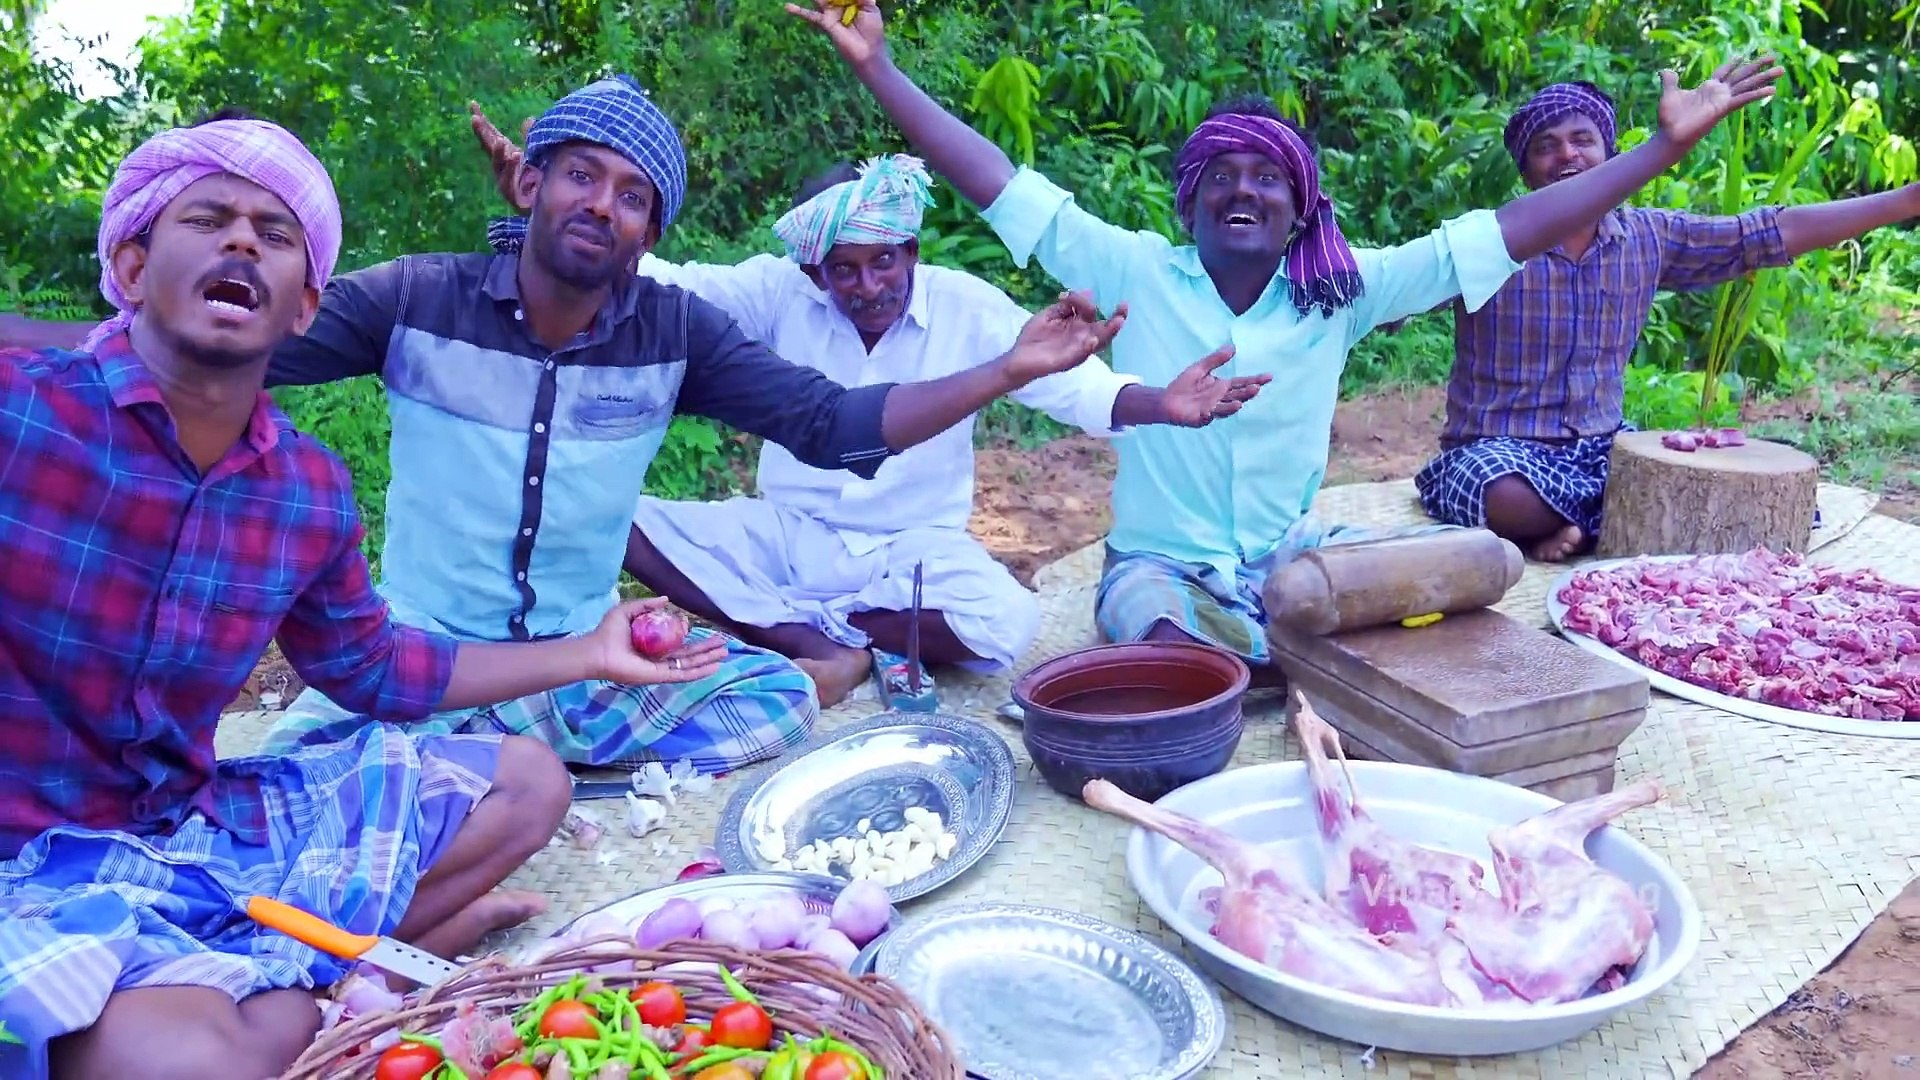 MUTTON DRY FRY - Varattu Kari - Chettinad Fried Mutton Recipe - Traditional Cooking in Village